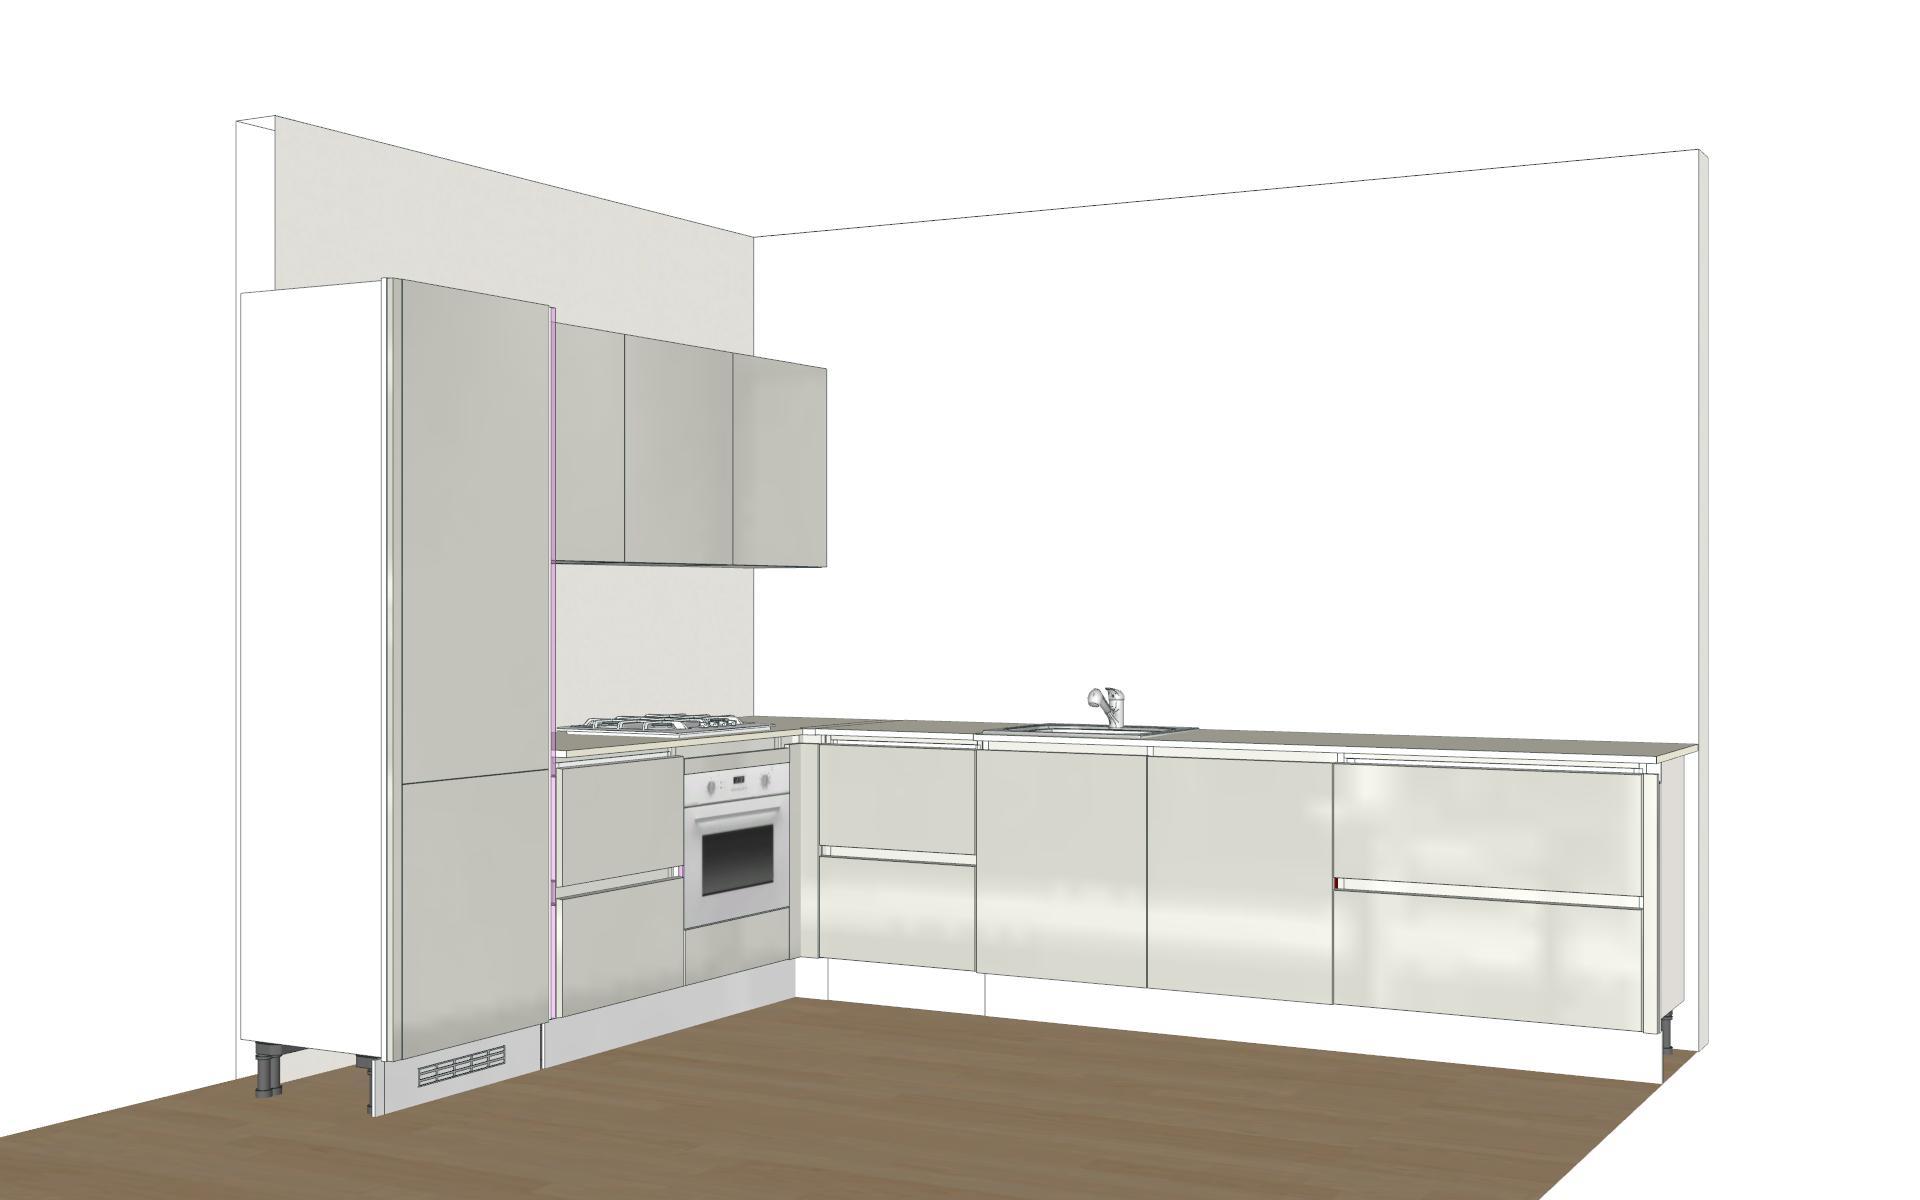 armony 000066. Black Bedroom Furniture Sets. Home Design Ideas